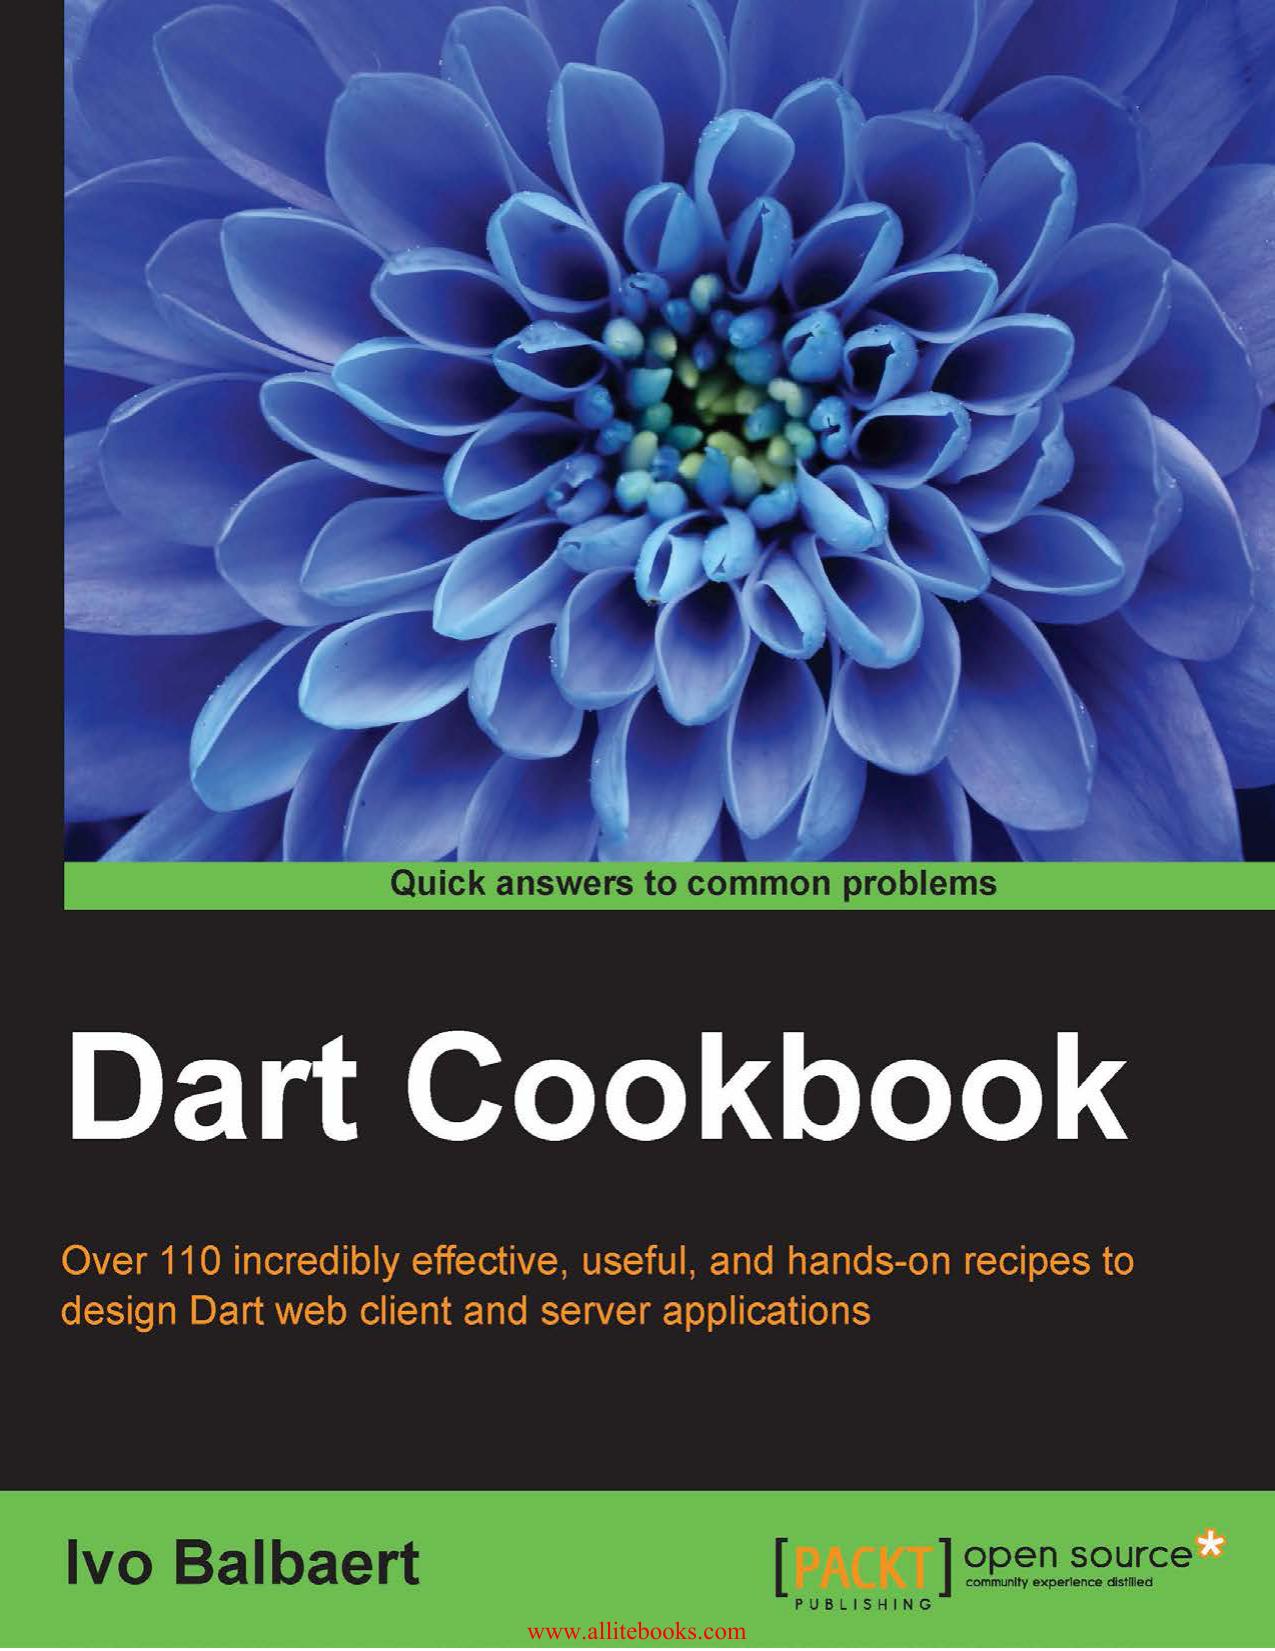 Dart Cookbook - All IT eBooks | manualzz com